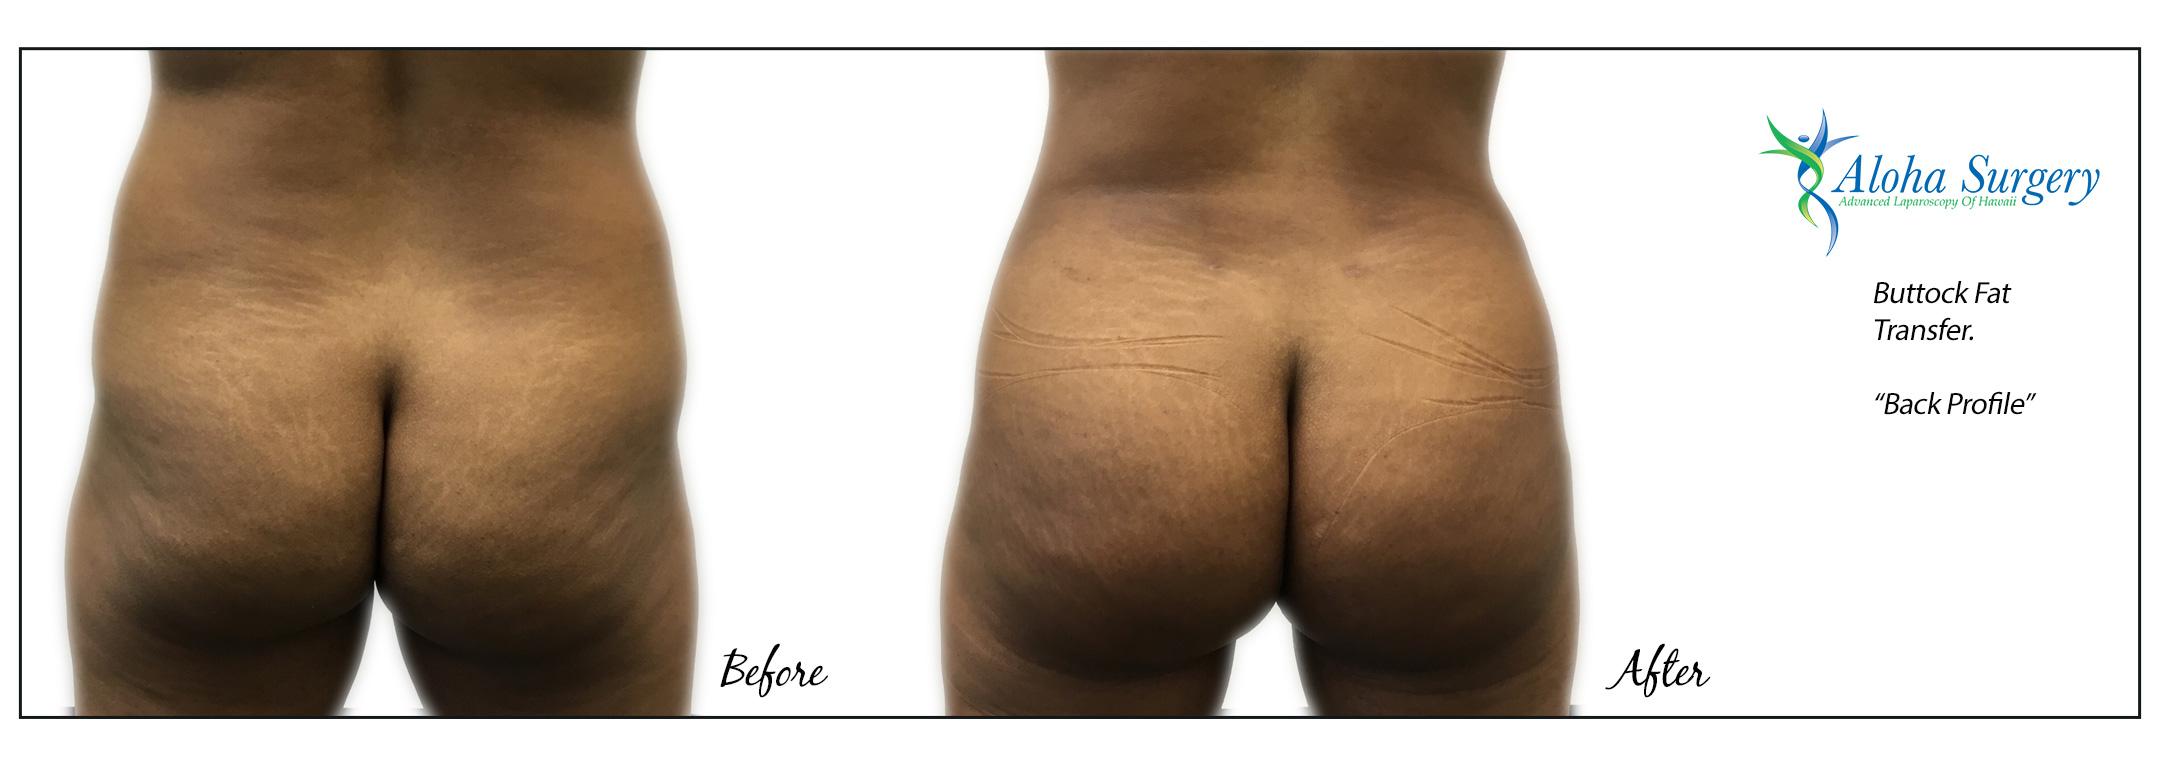 Aloha Surgery Buttock Fat Transfer